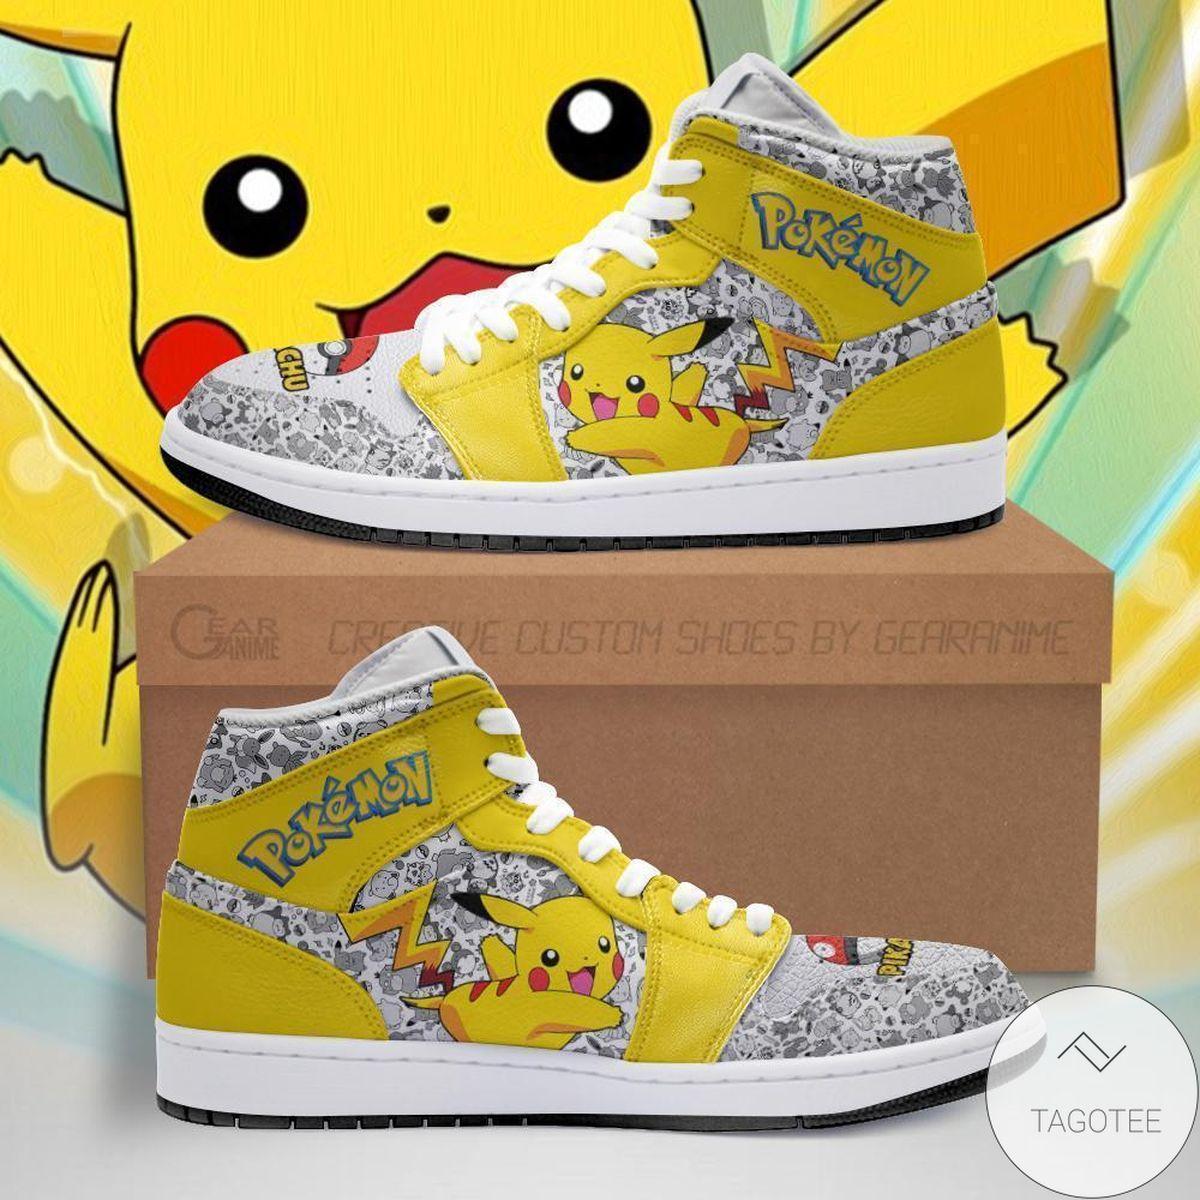 eBay Pikachu Pokemon Air Jordan High Top Shoes